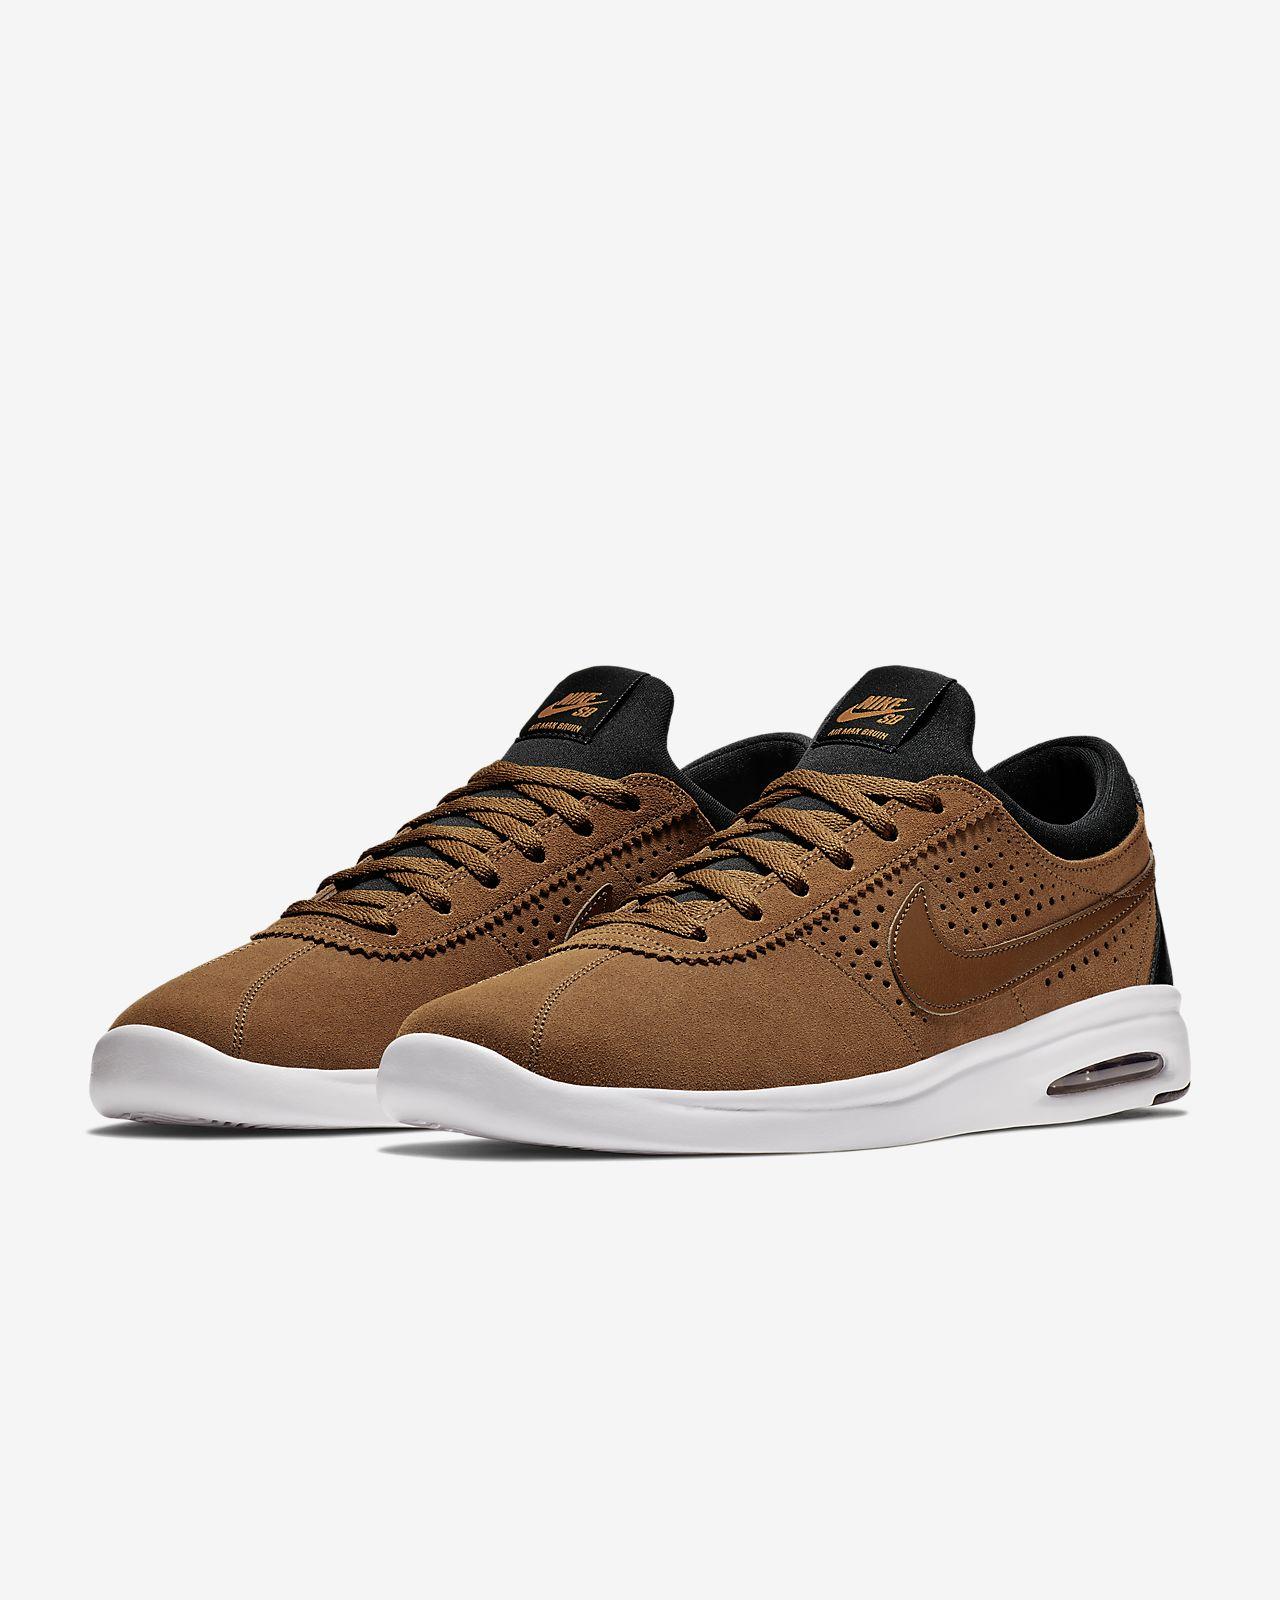 b25315191b2606 Nike SB Air Max Bruin Vapor Men s Skate Shoe. Nike.com